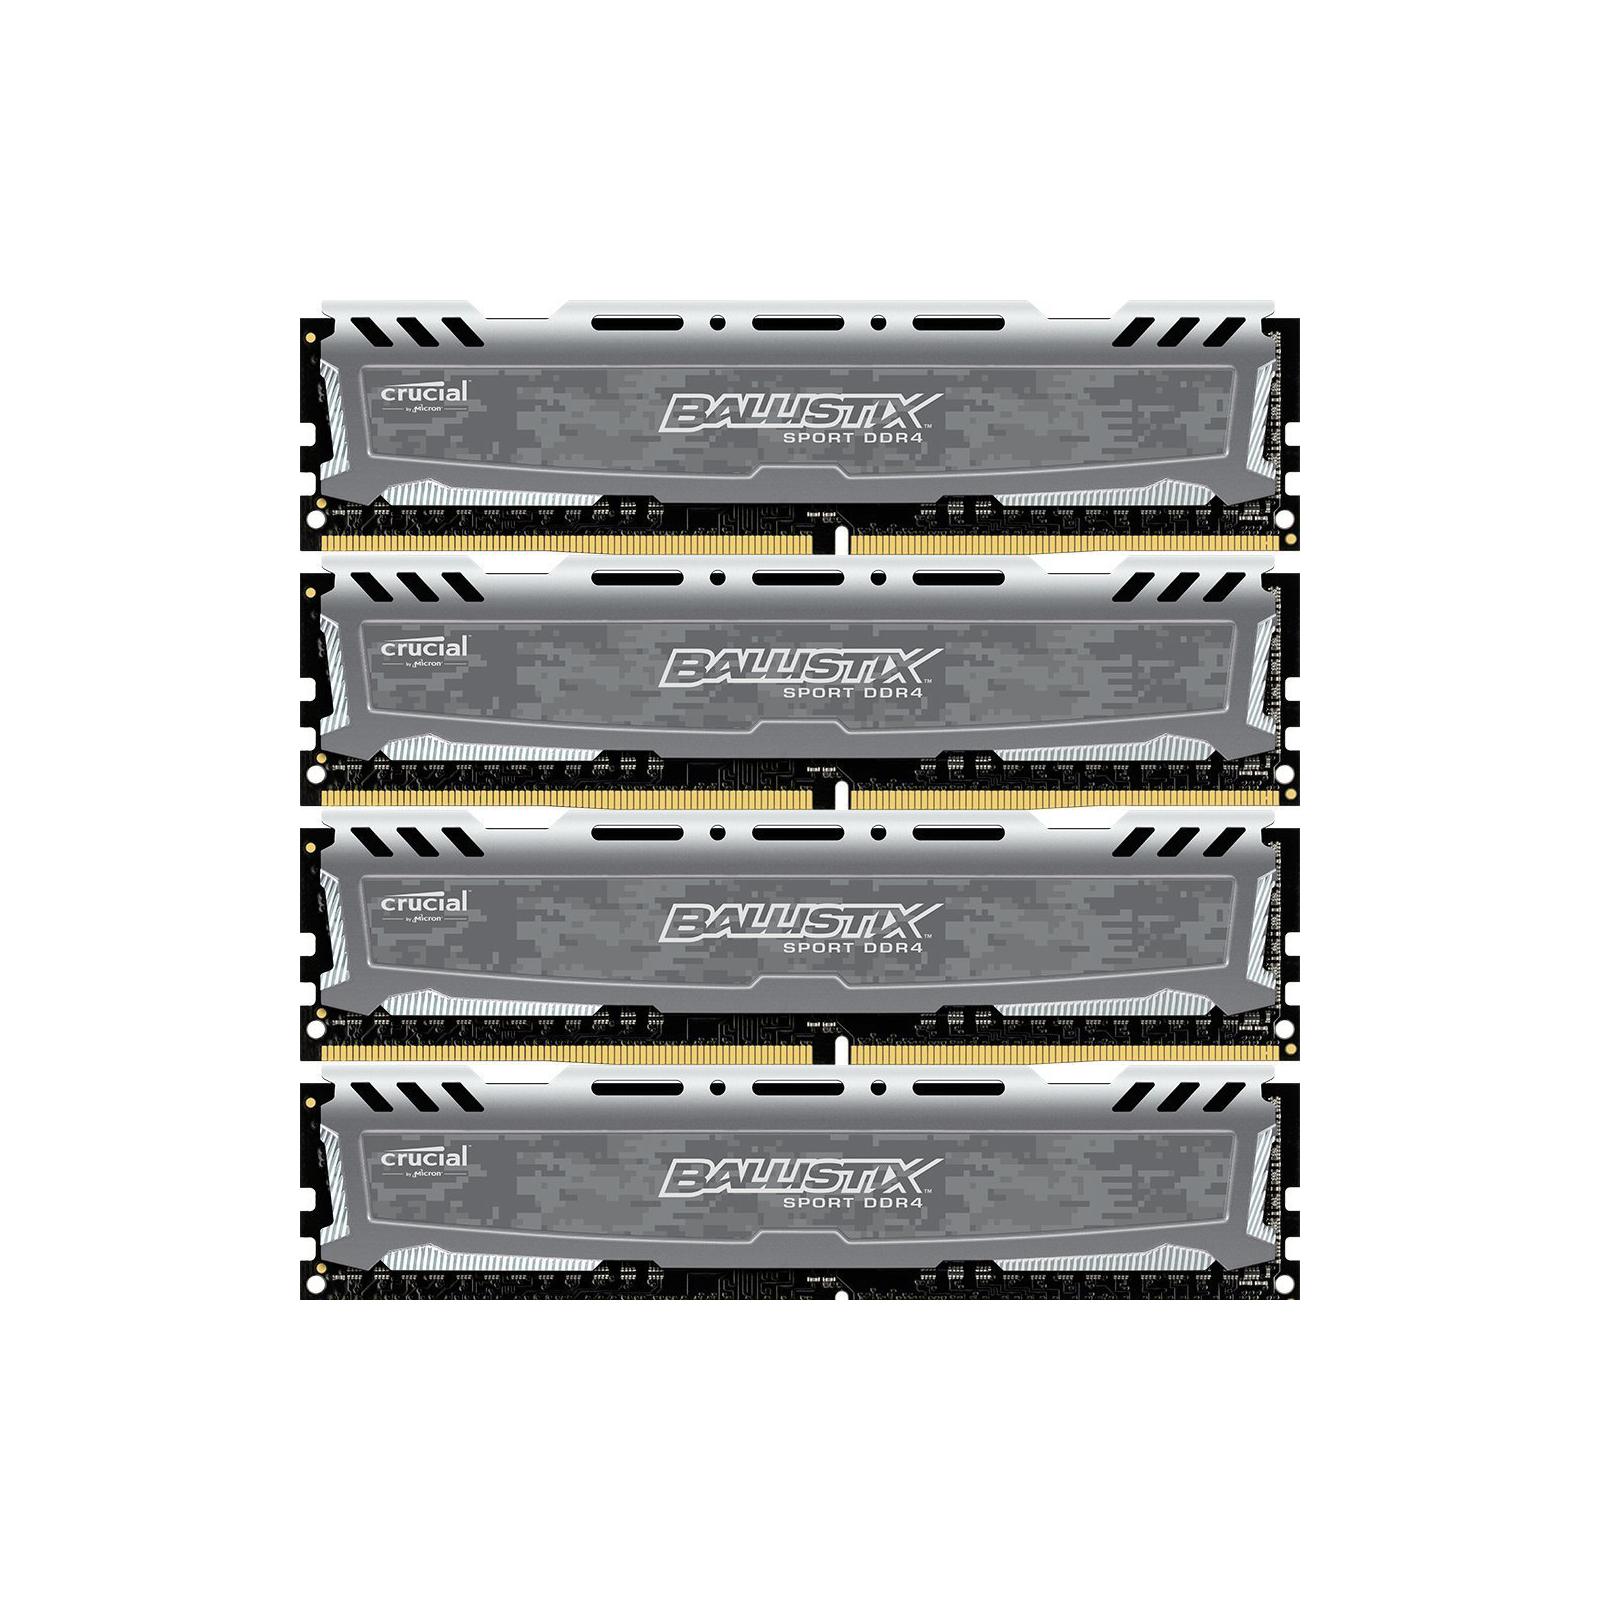 Модуль памяти для компьютера DDR4 16GB (4x4GB) 2400 MHz Ballistix Sport MICRON (BLS4C4G4D240FSB)